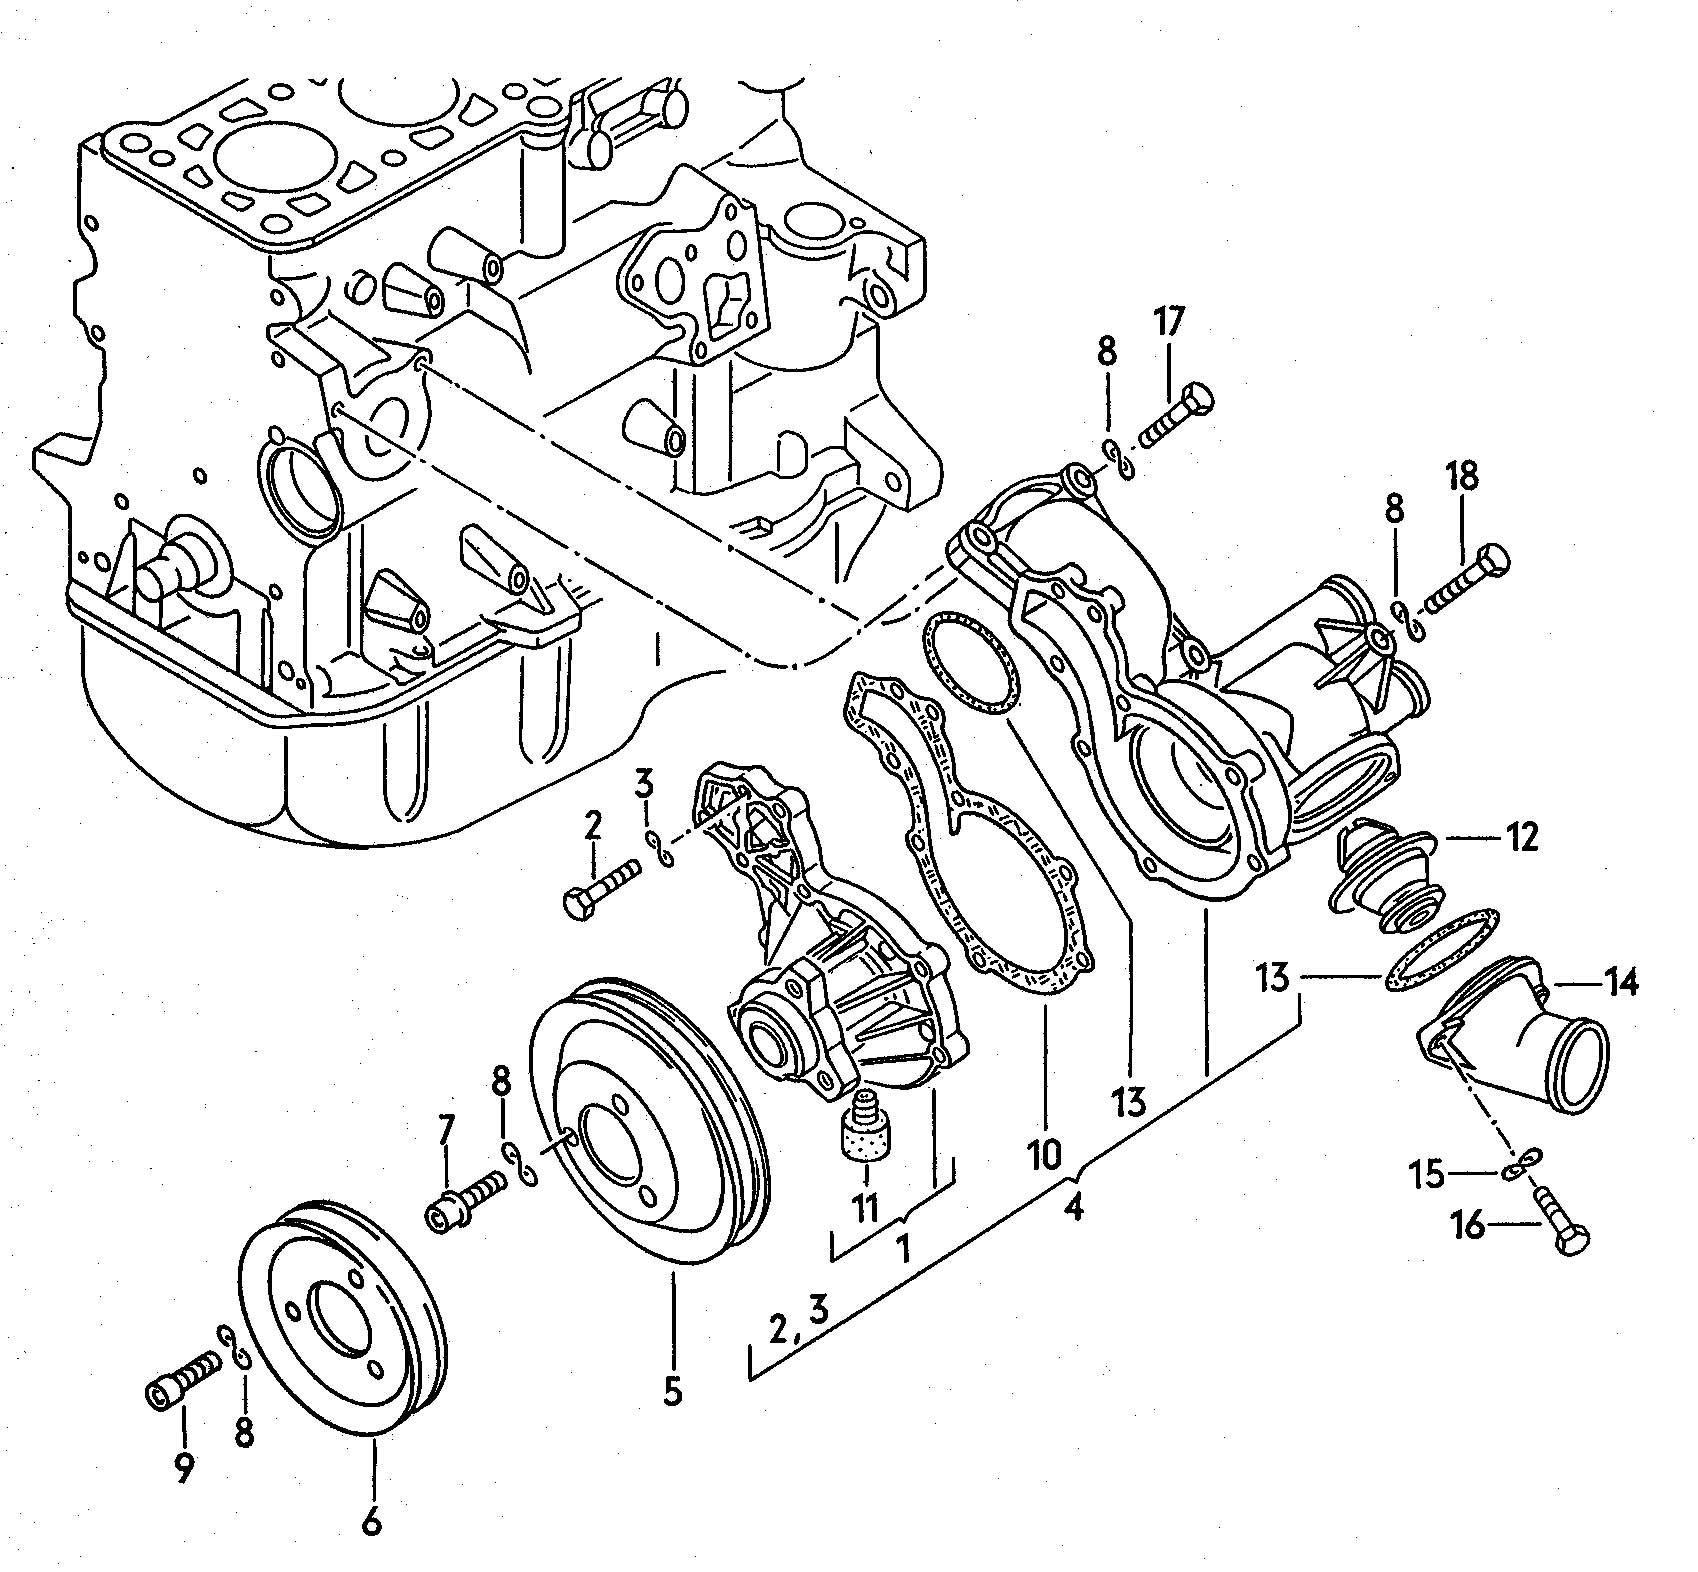 Yamaha Jg5 Golf Cart Manual G19 Wiring Diagram Ezgo Club Car Solenoids